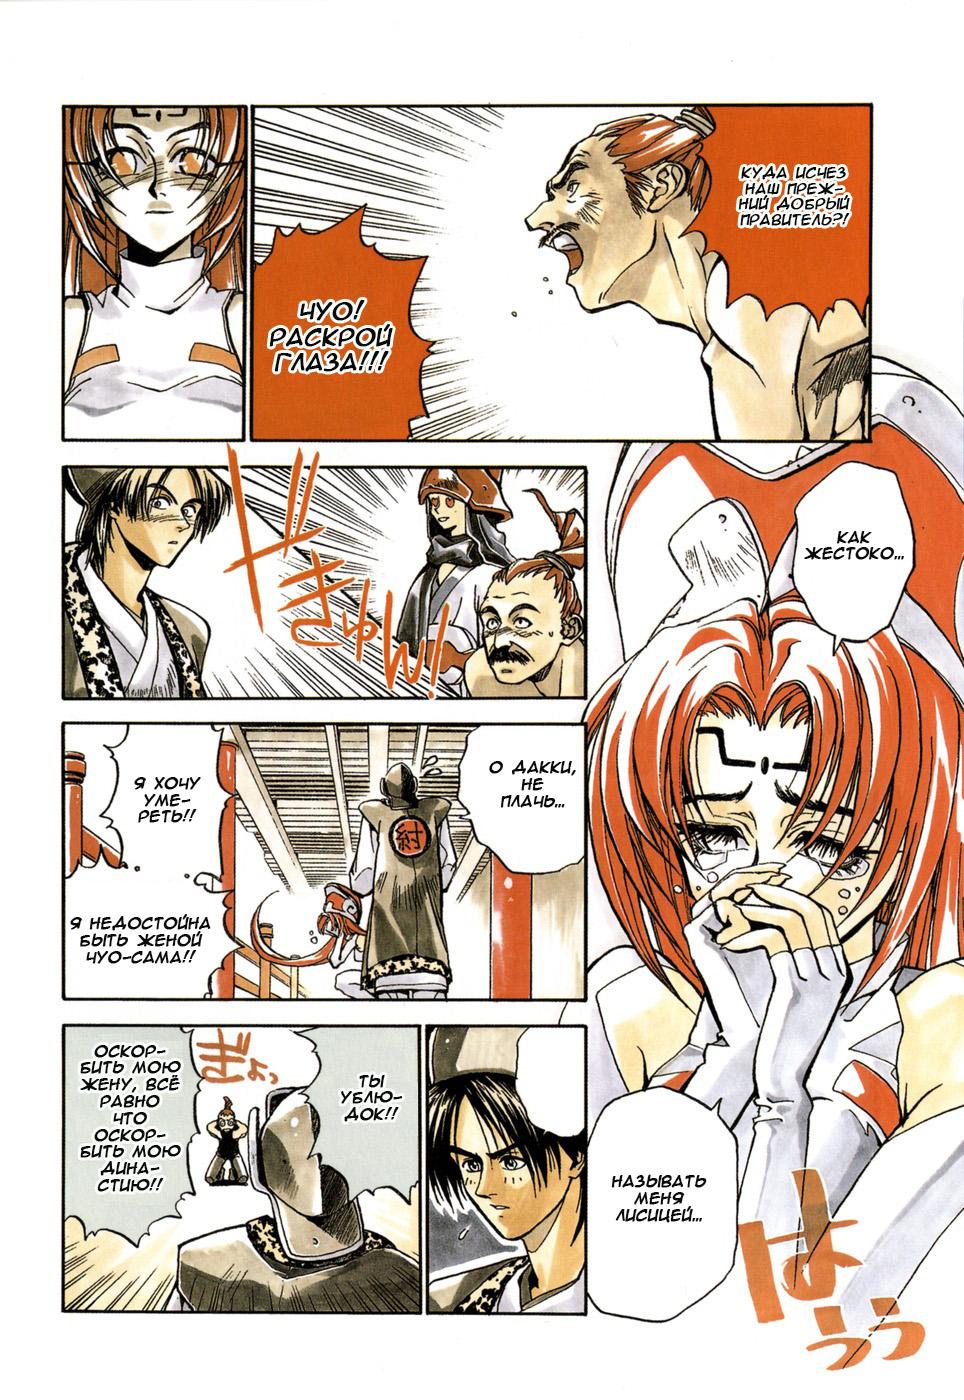 https://r1.ninemanga.com/comics/pic2/22/33366/344548/1512250166462.jpg Page 4